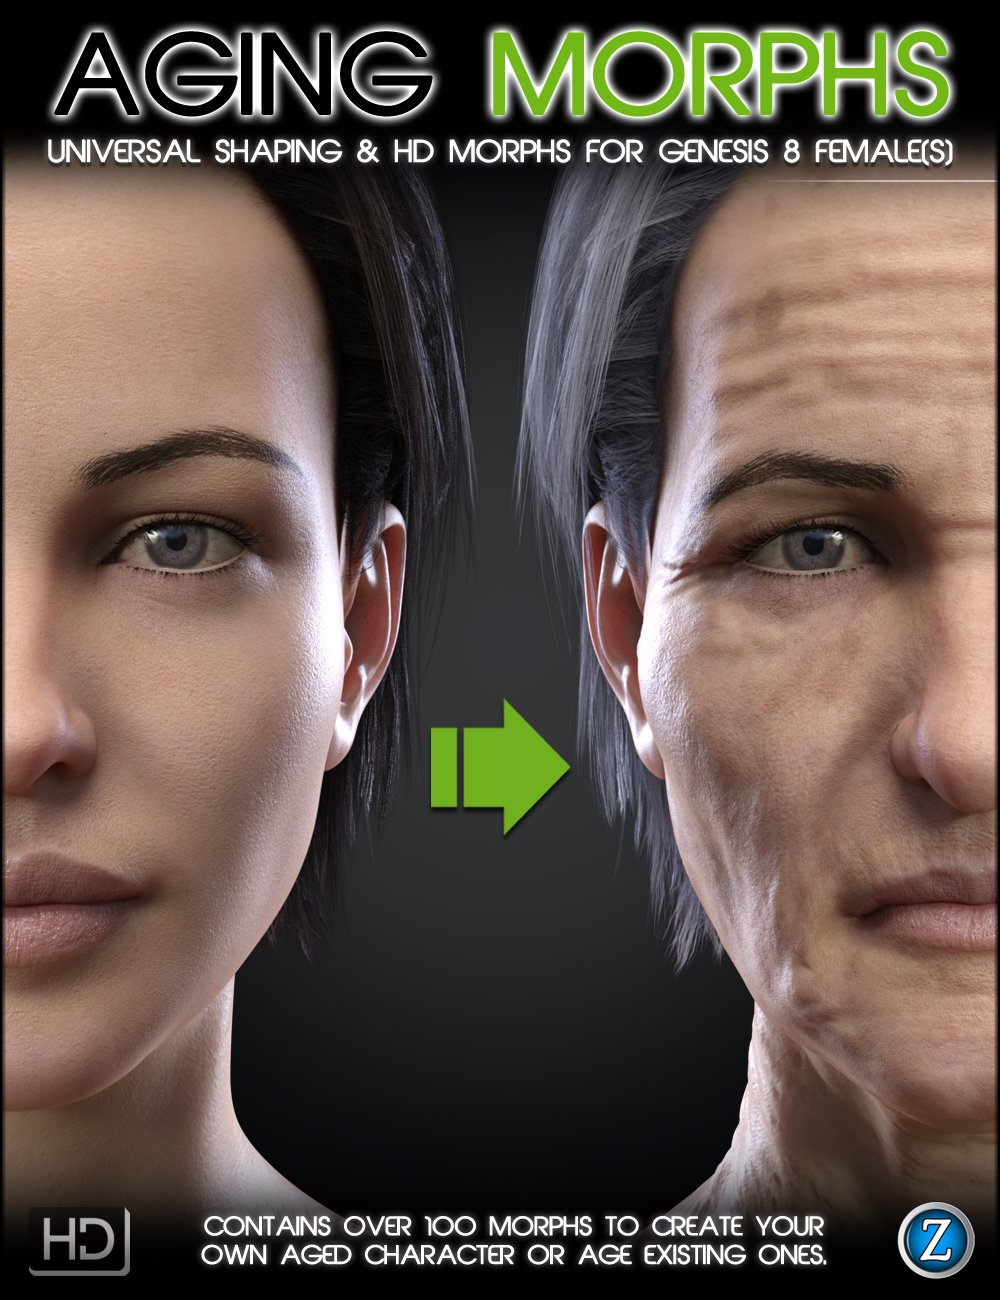 Aging Morphs for Genesis 8 Female(s) by: Zev0, 3D Models by Daz 3D